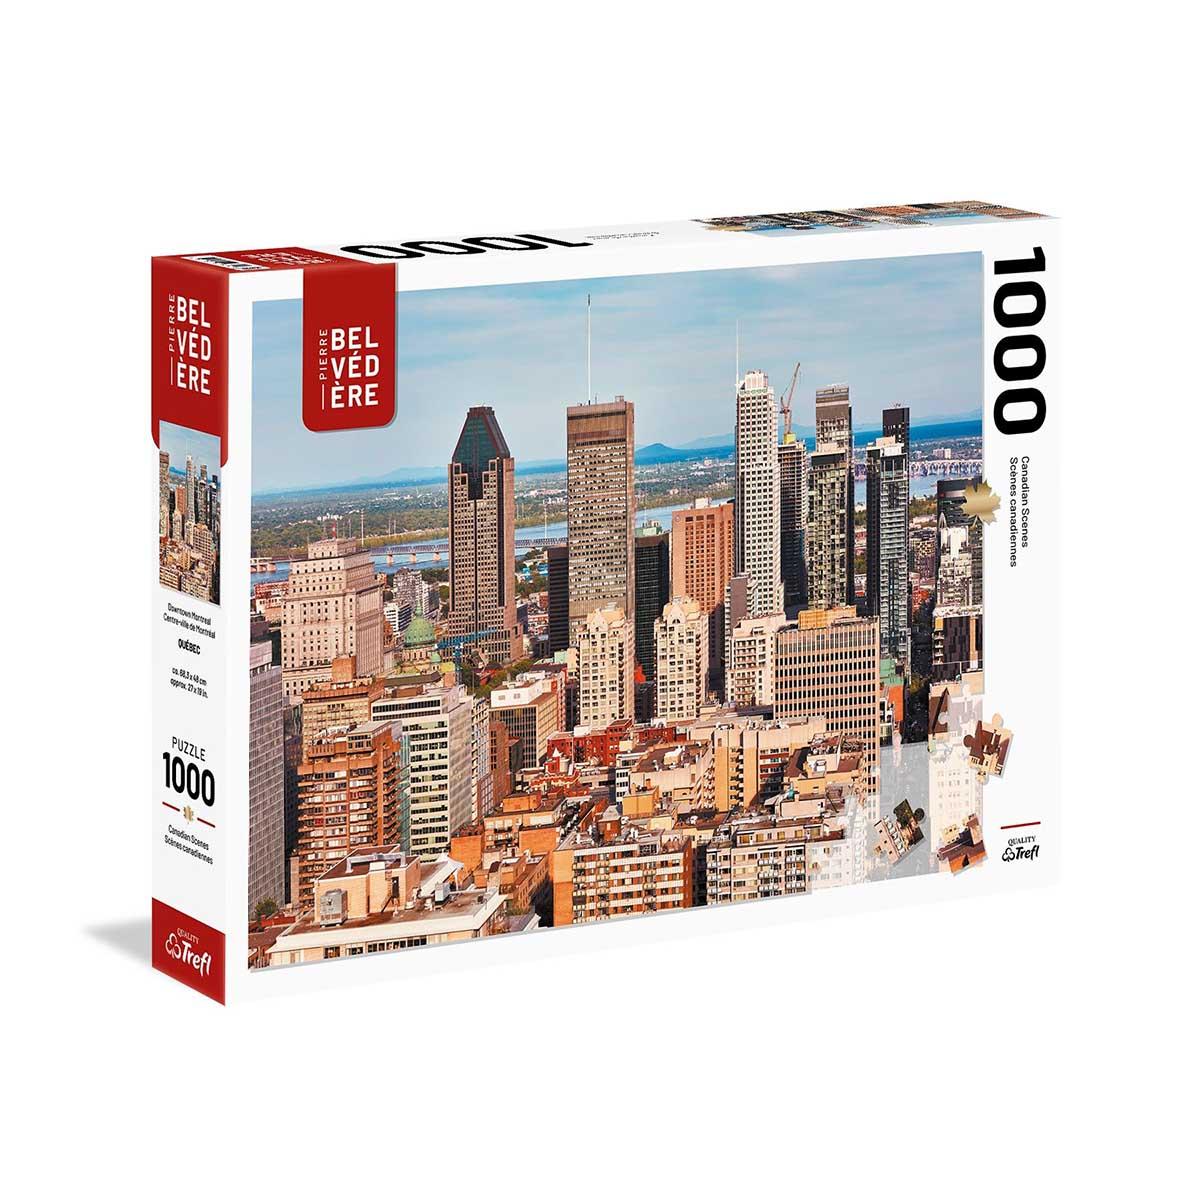 Montreal Skyline / Cityscape Jigsaw Puzzle